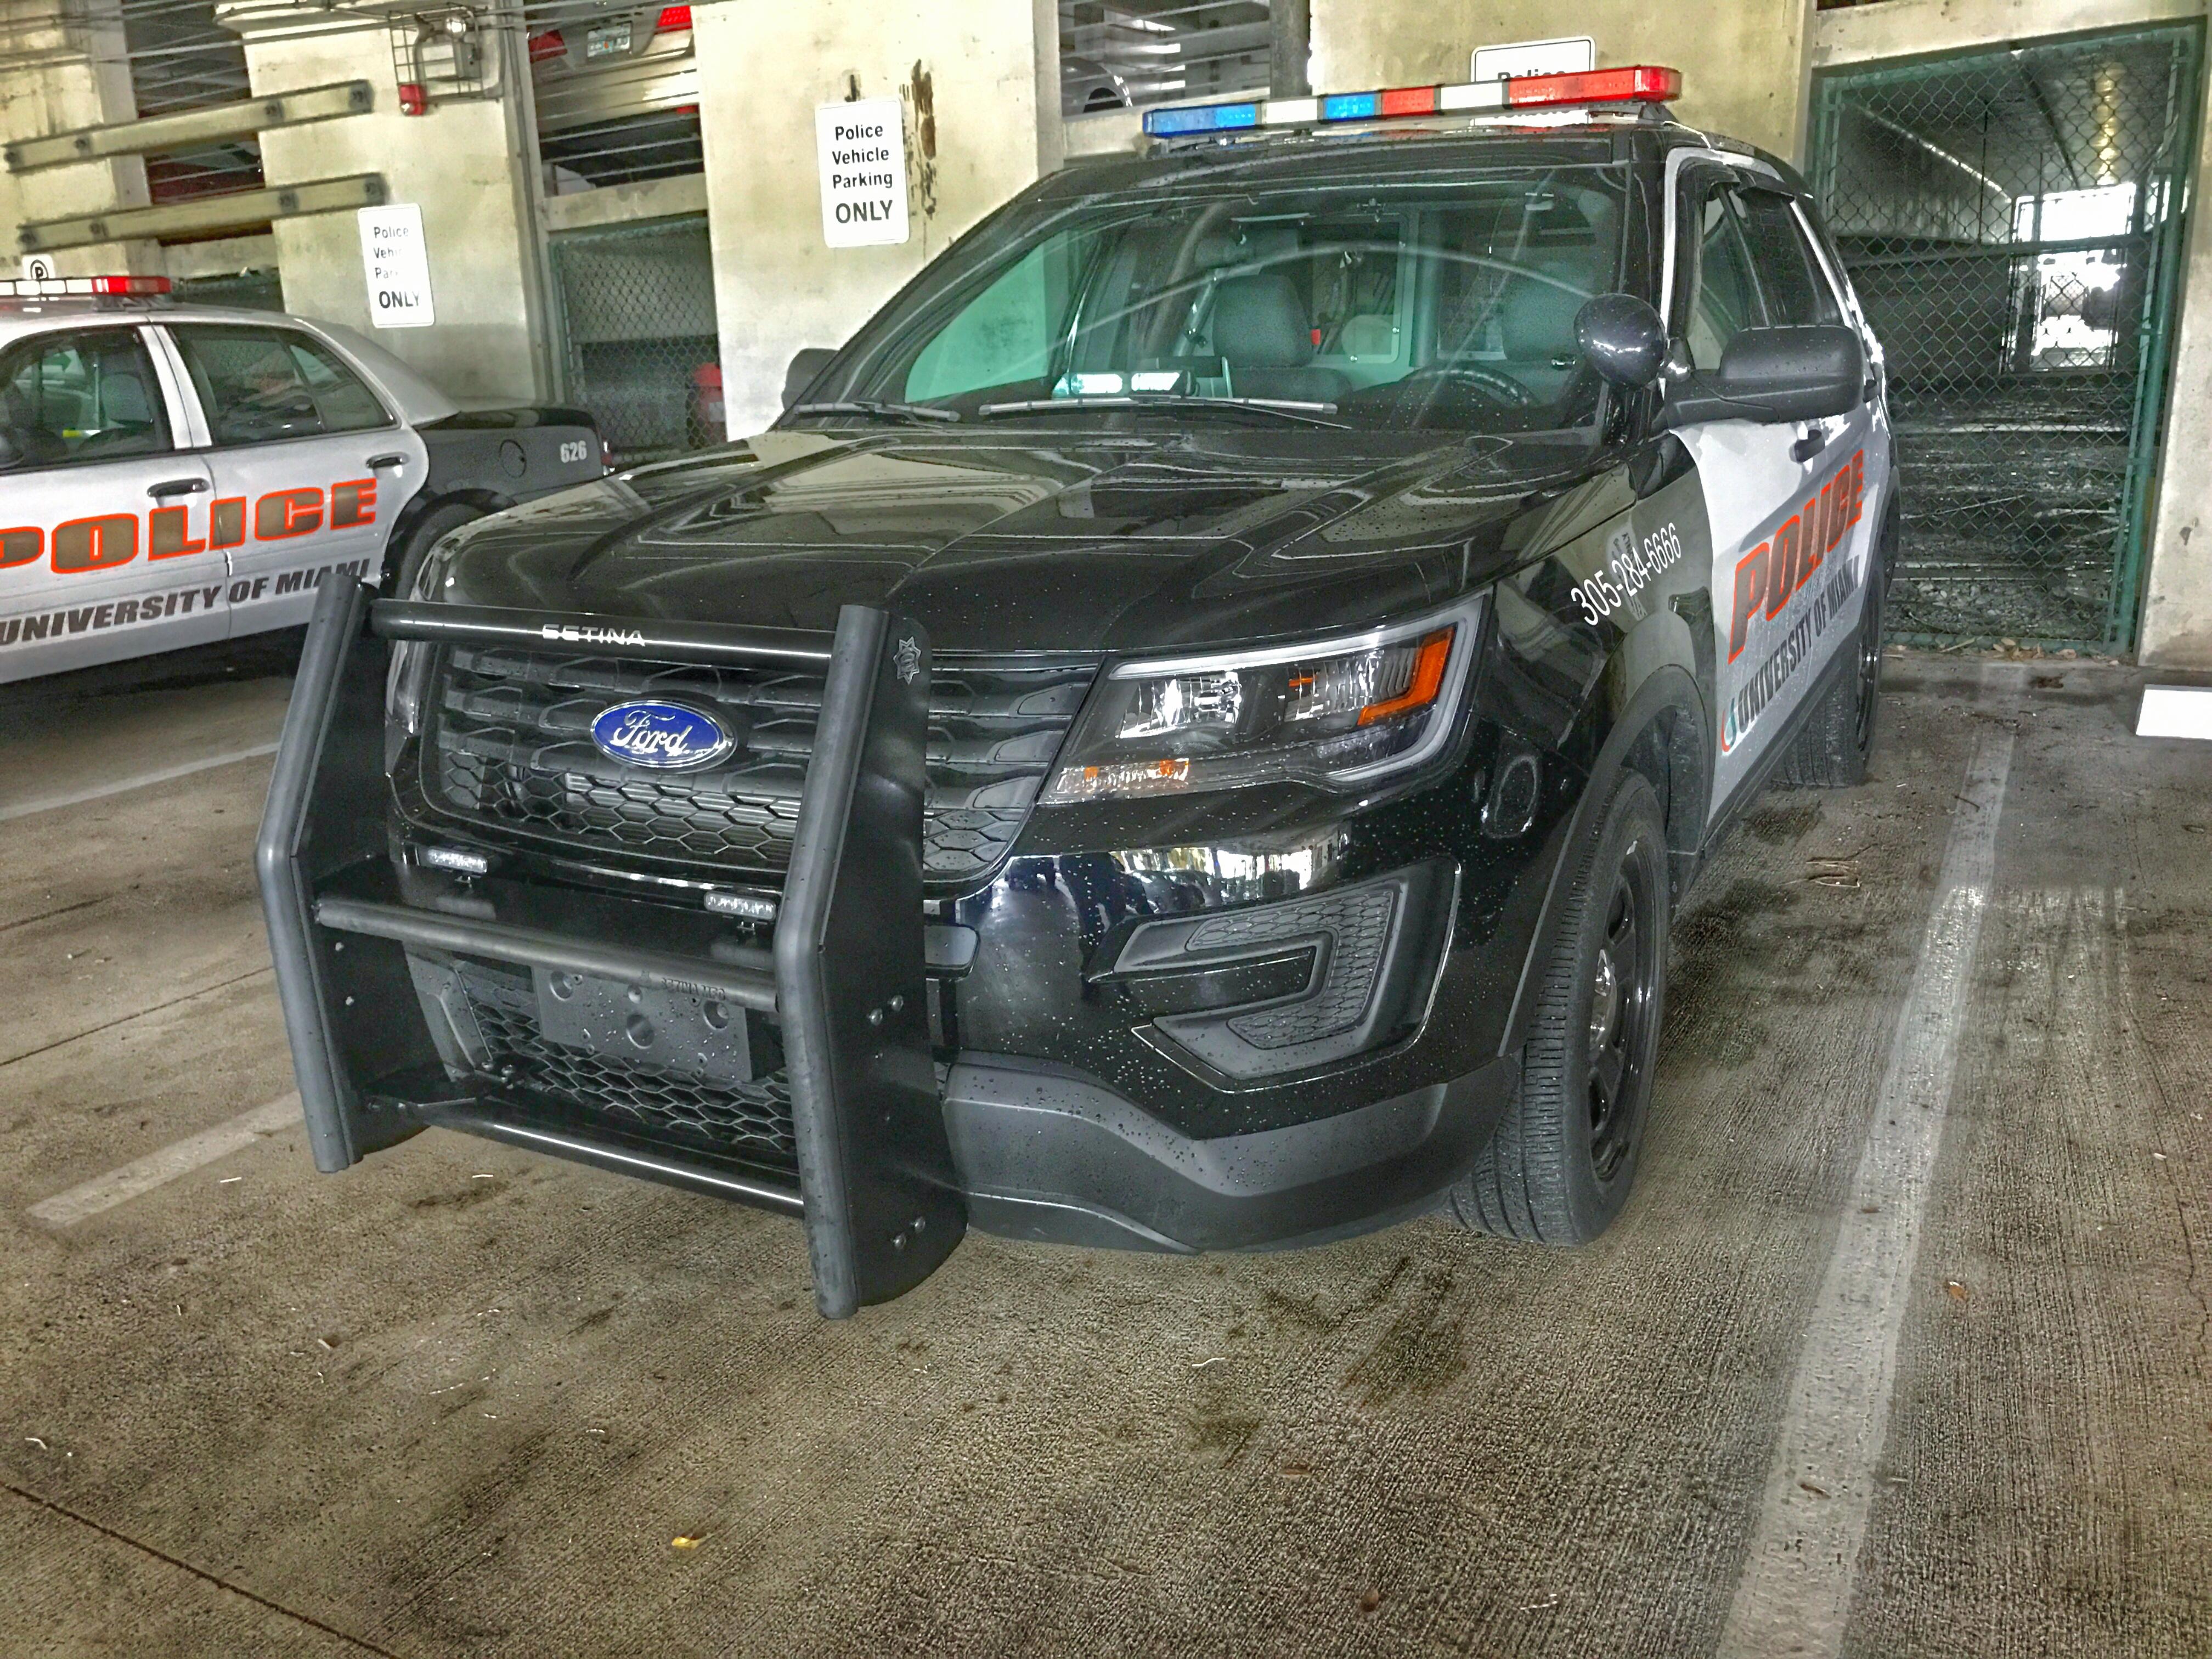 University of Miami Police